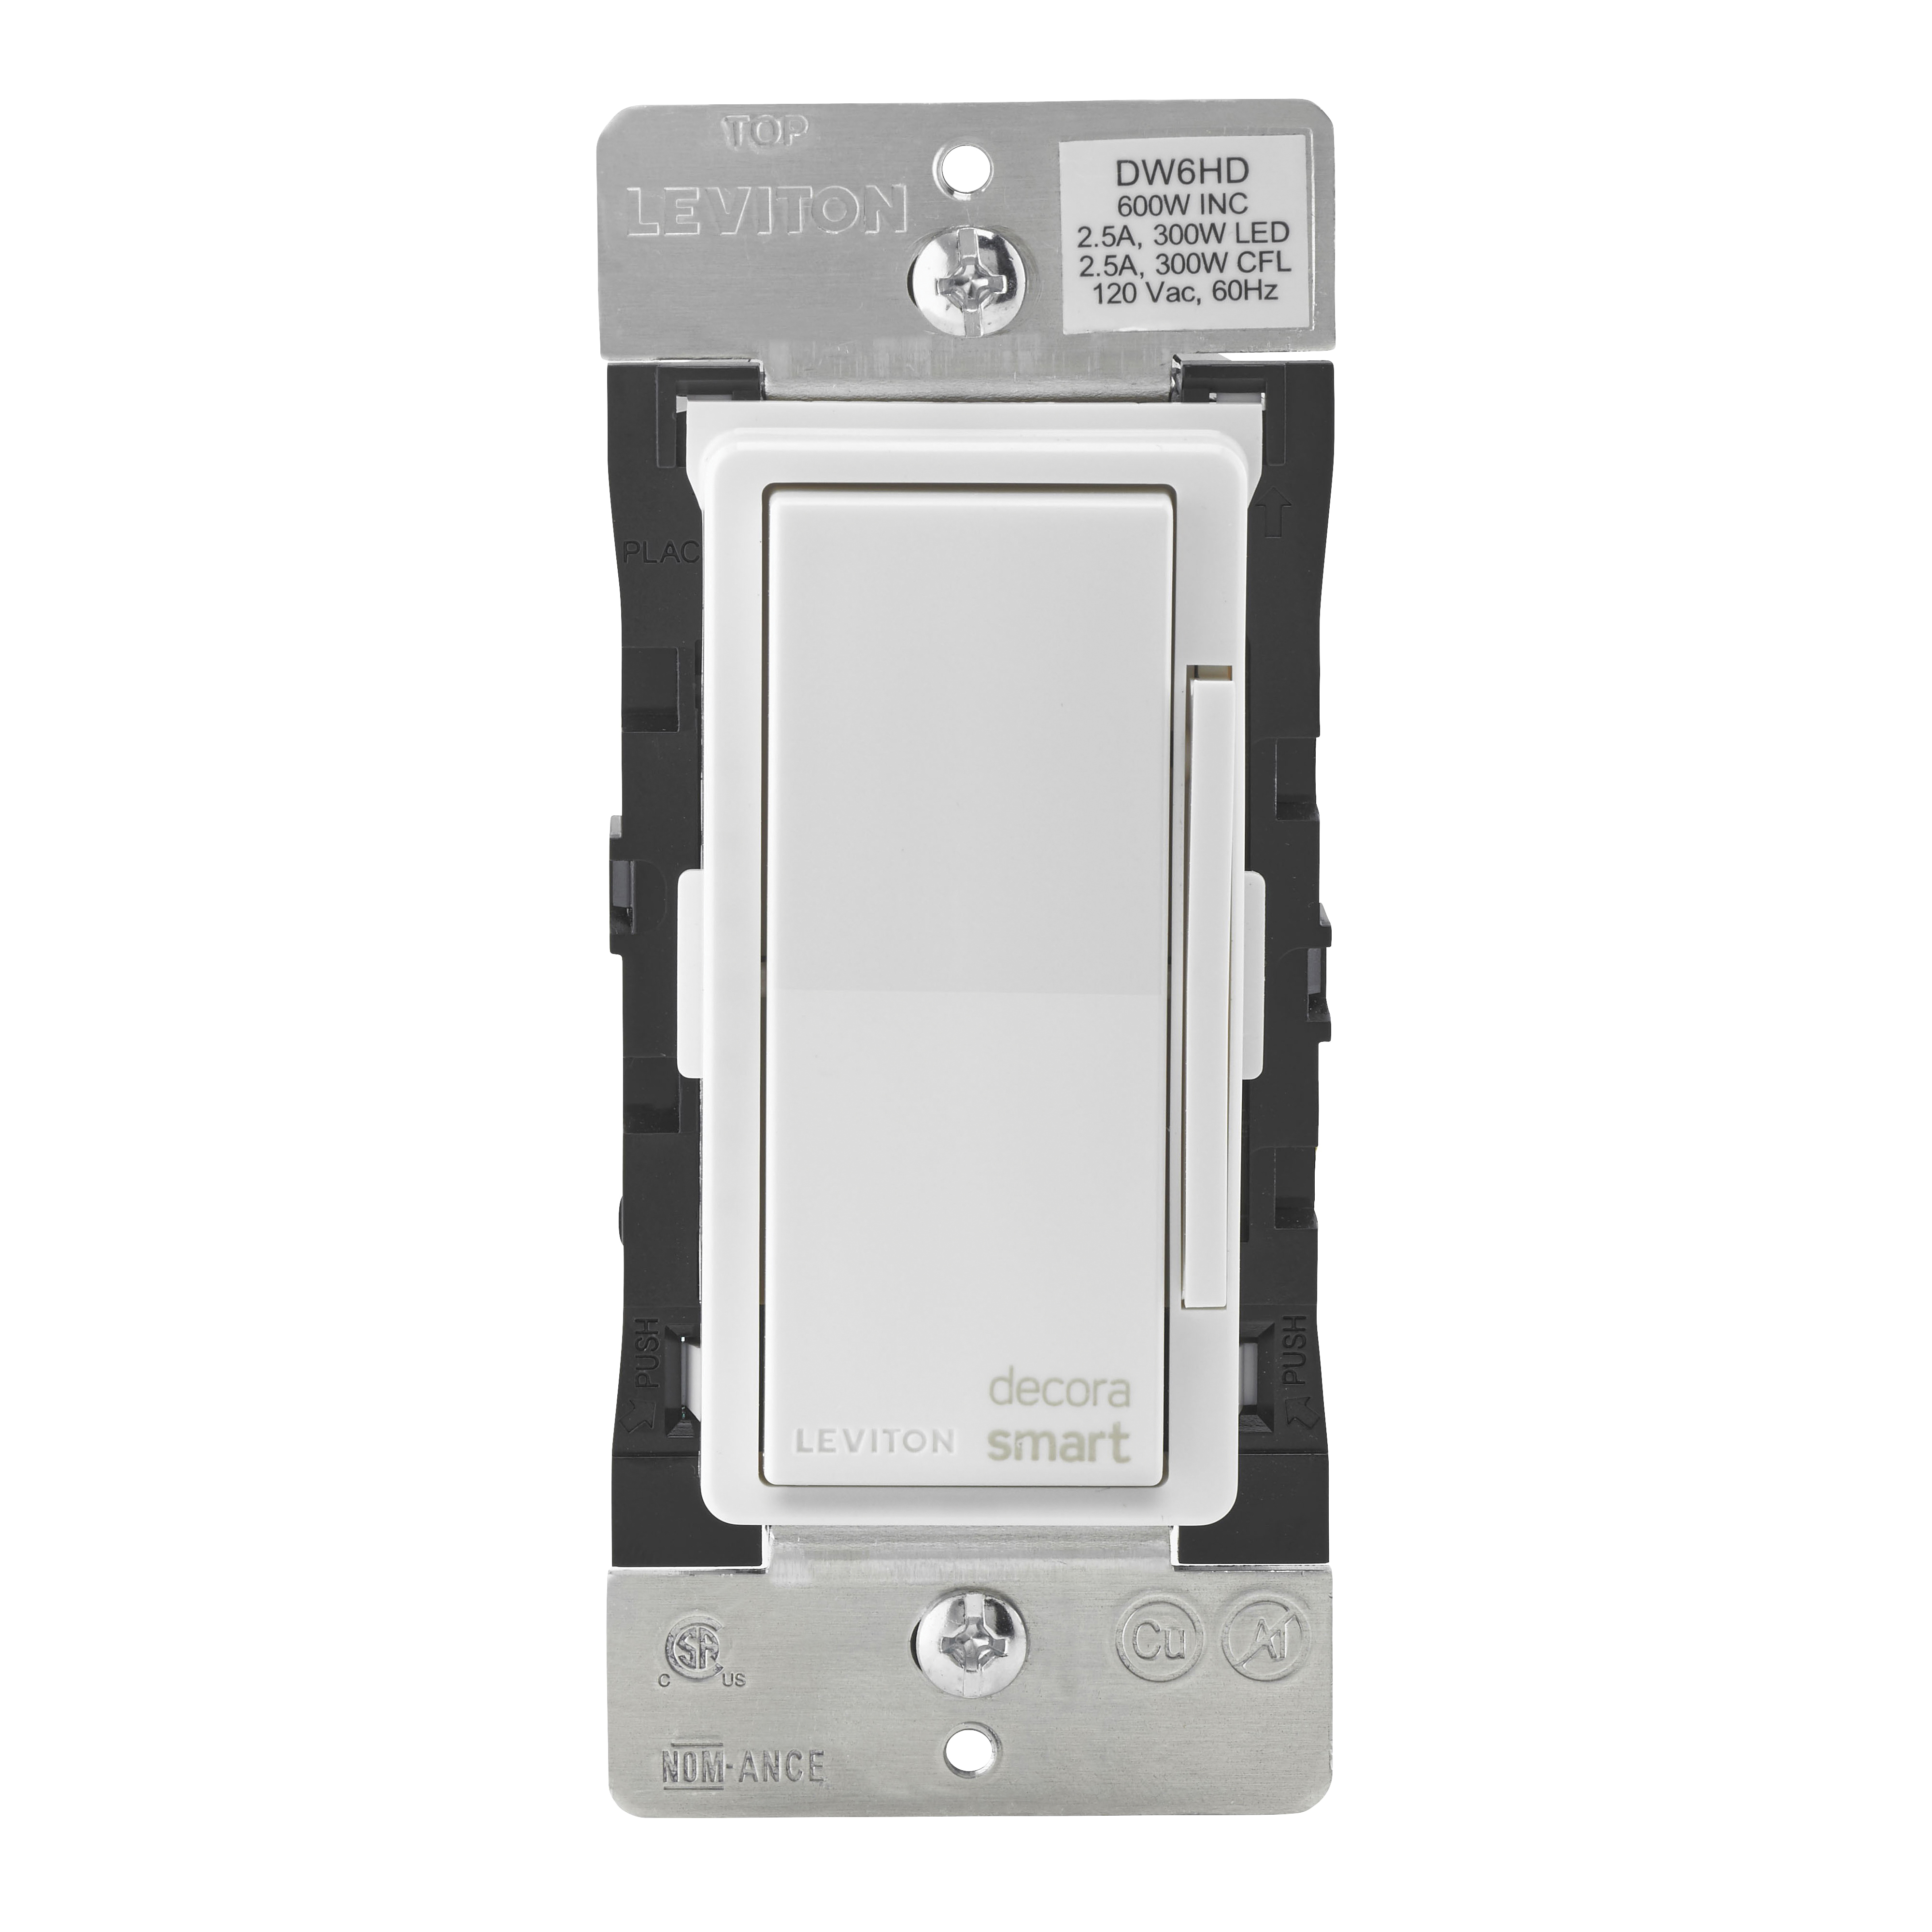 Picture of Leviton Decora Smart R01-DW6HD-1RZ Dimmer, 1-Pole, 3-Way, 120 V, 60 Hz, Wi-Fi, Hardwired, Light Almond/White